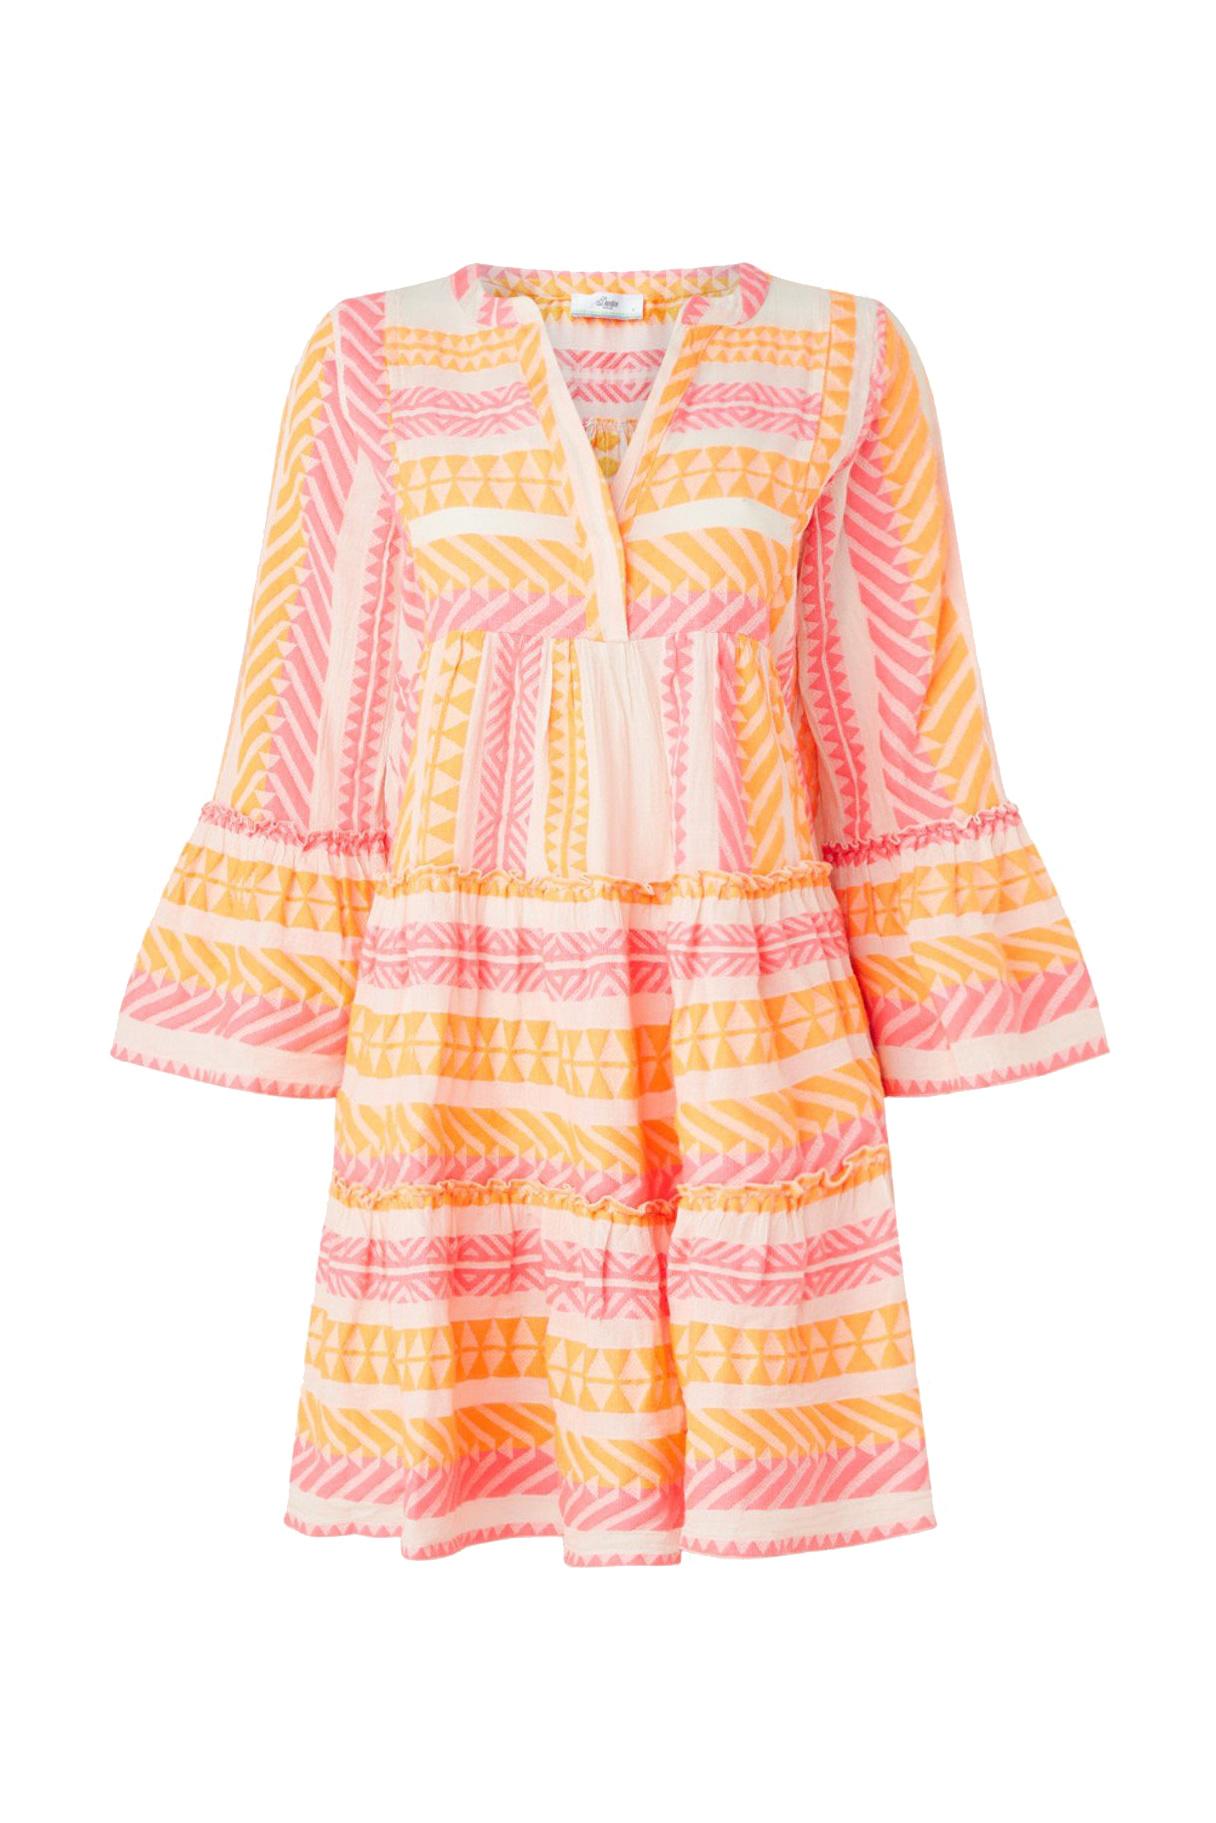 Short Dress Neon Ella - Neon Pink / Neon Orange-1